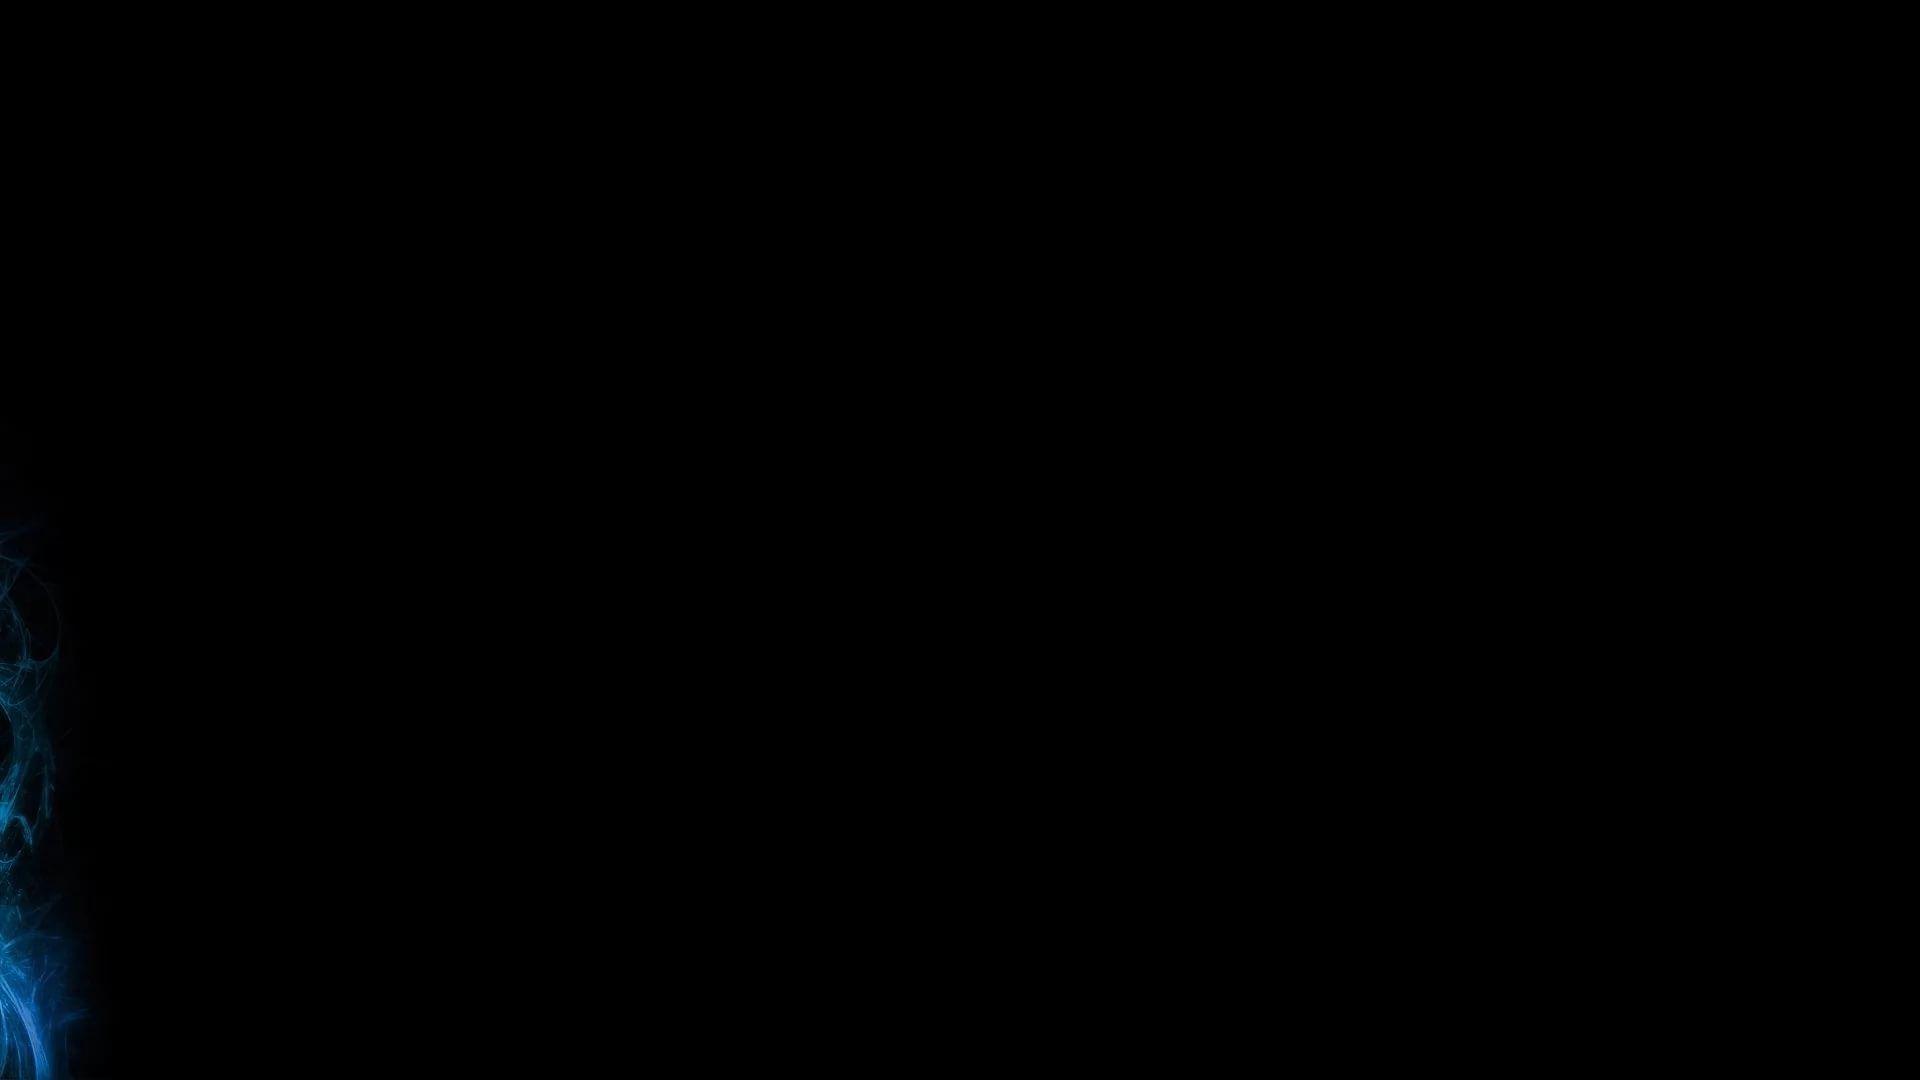 Black Screen download wallpaper image